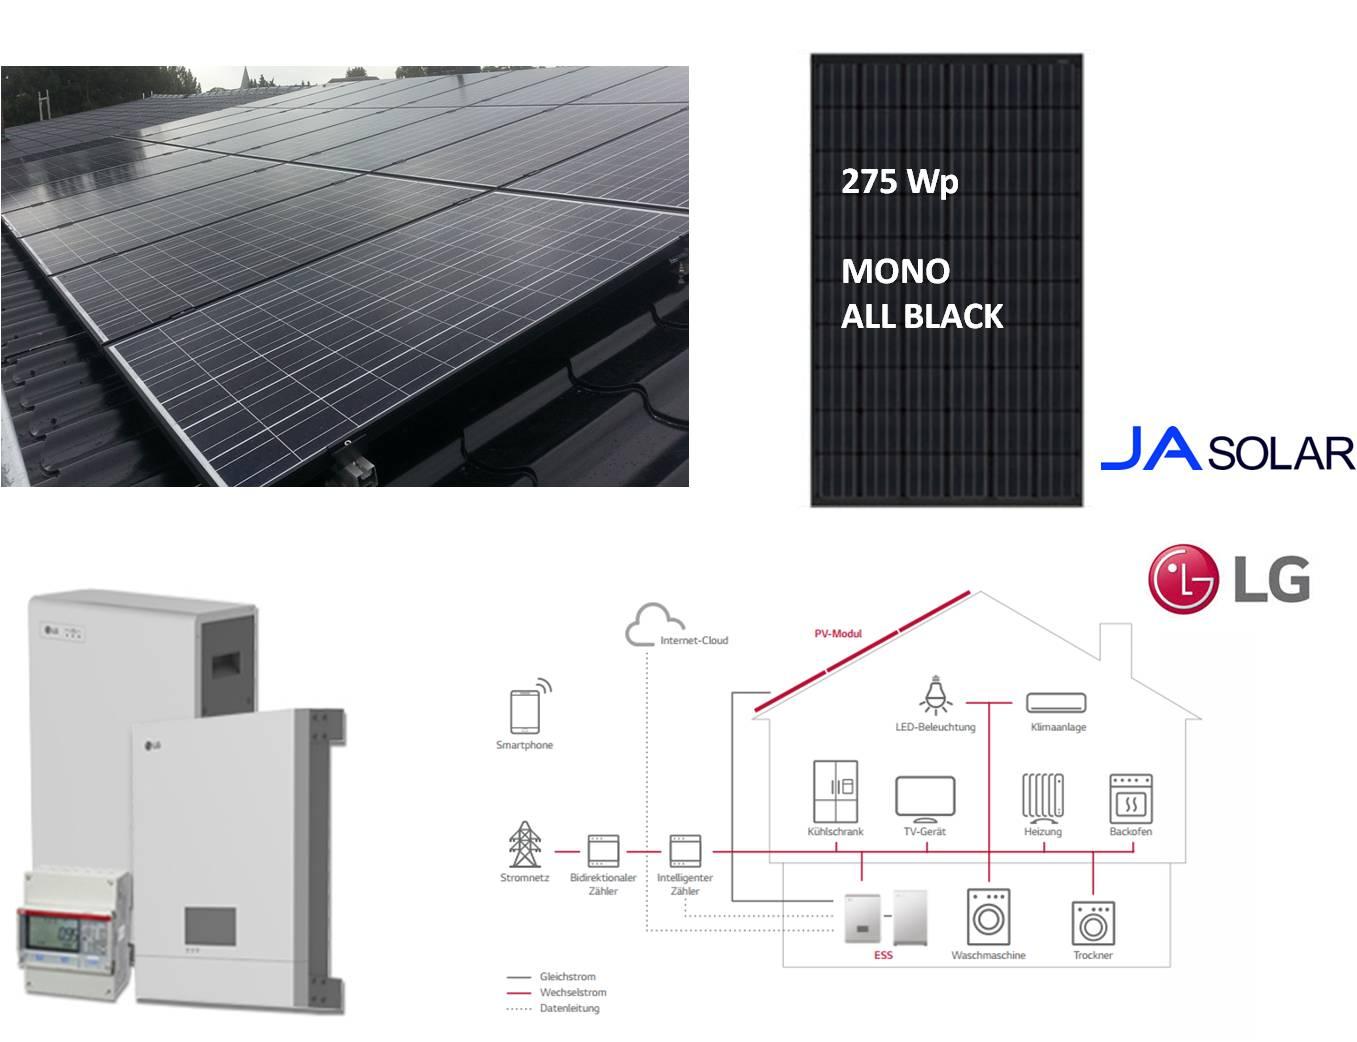 photovoltaik montagesysteme kabel zubeh r speicherpaket shop europe. Black Bedroom Furniture Sets. Home Design Ideas